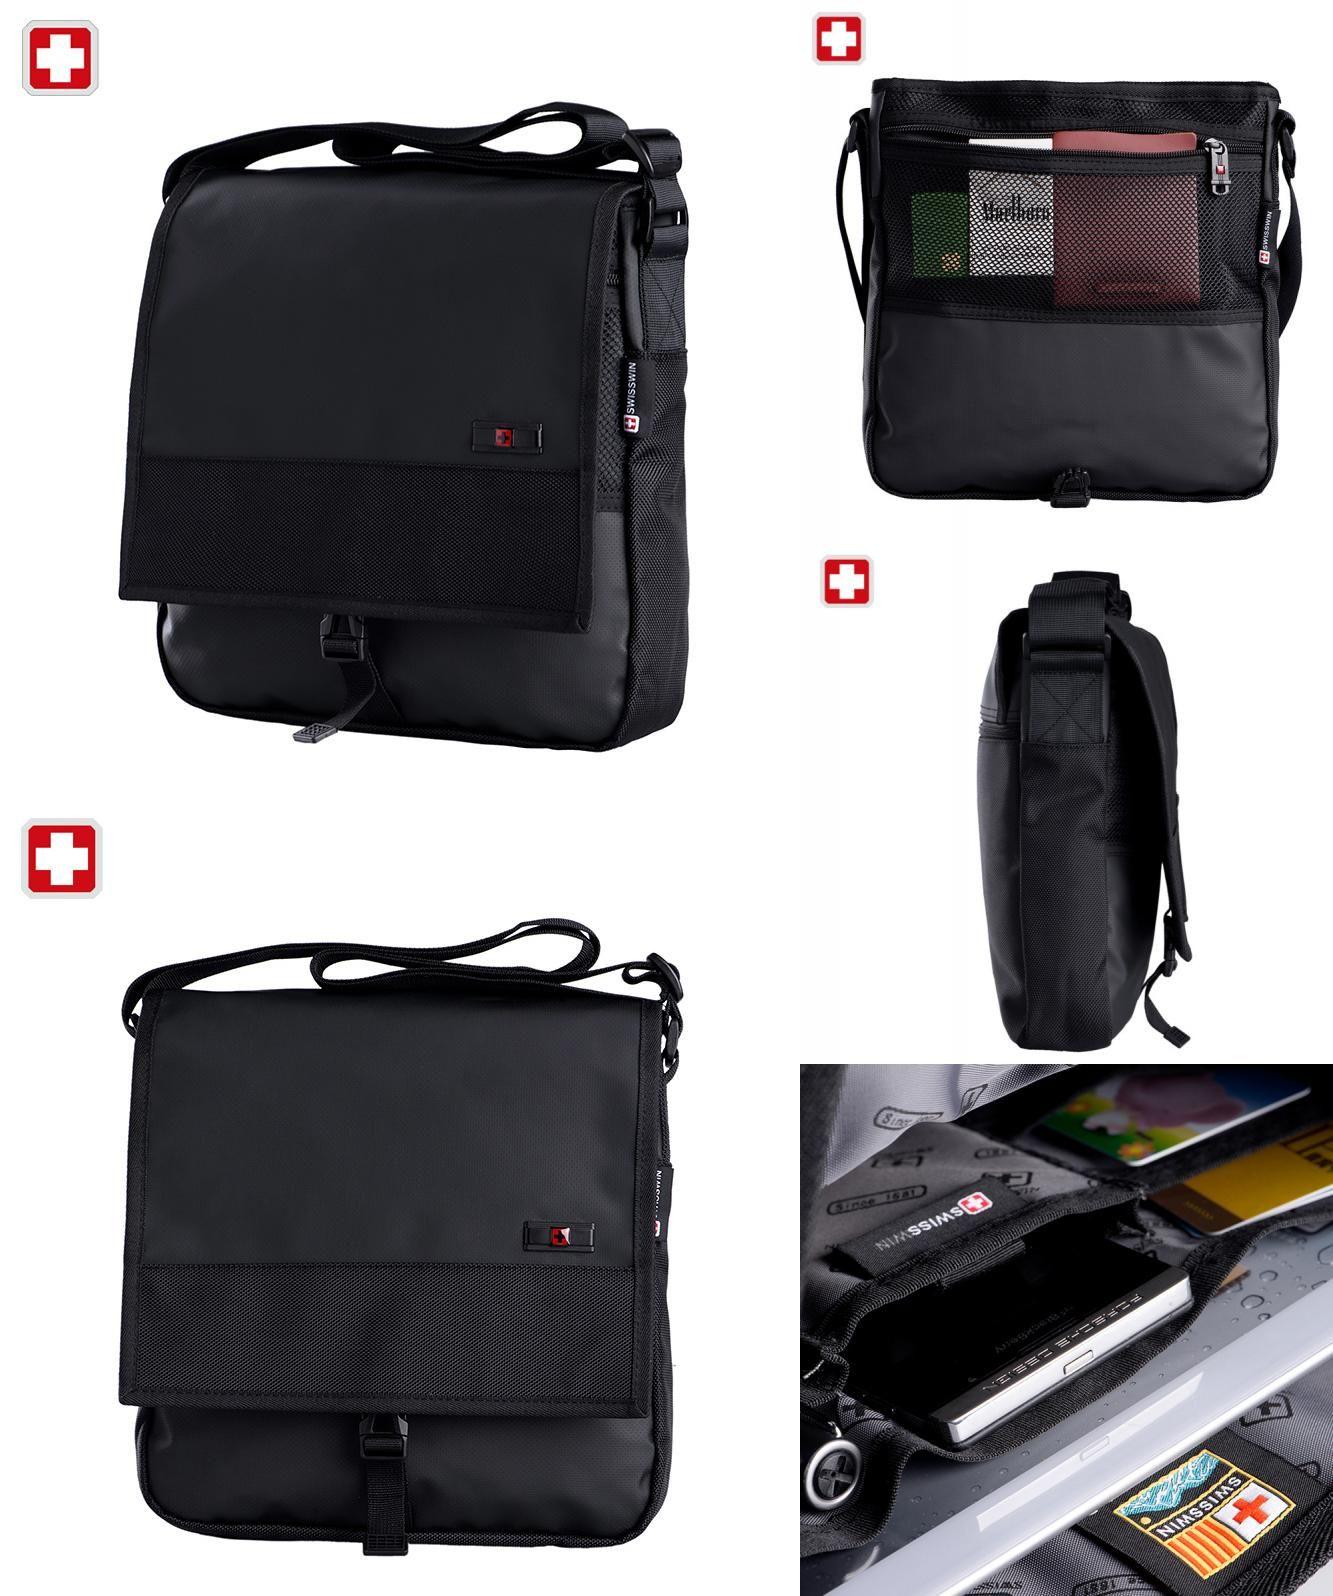 Visit to Buy  Swisswin Business Casual Messenger Bag Brand Casual Shoulder  Bag Medium Size 0e8beeebe8